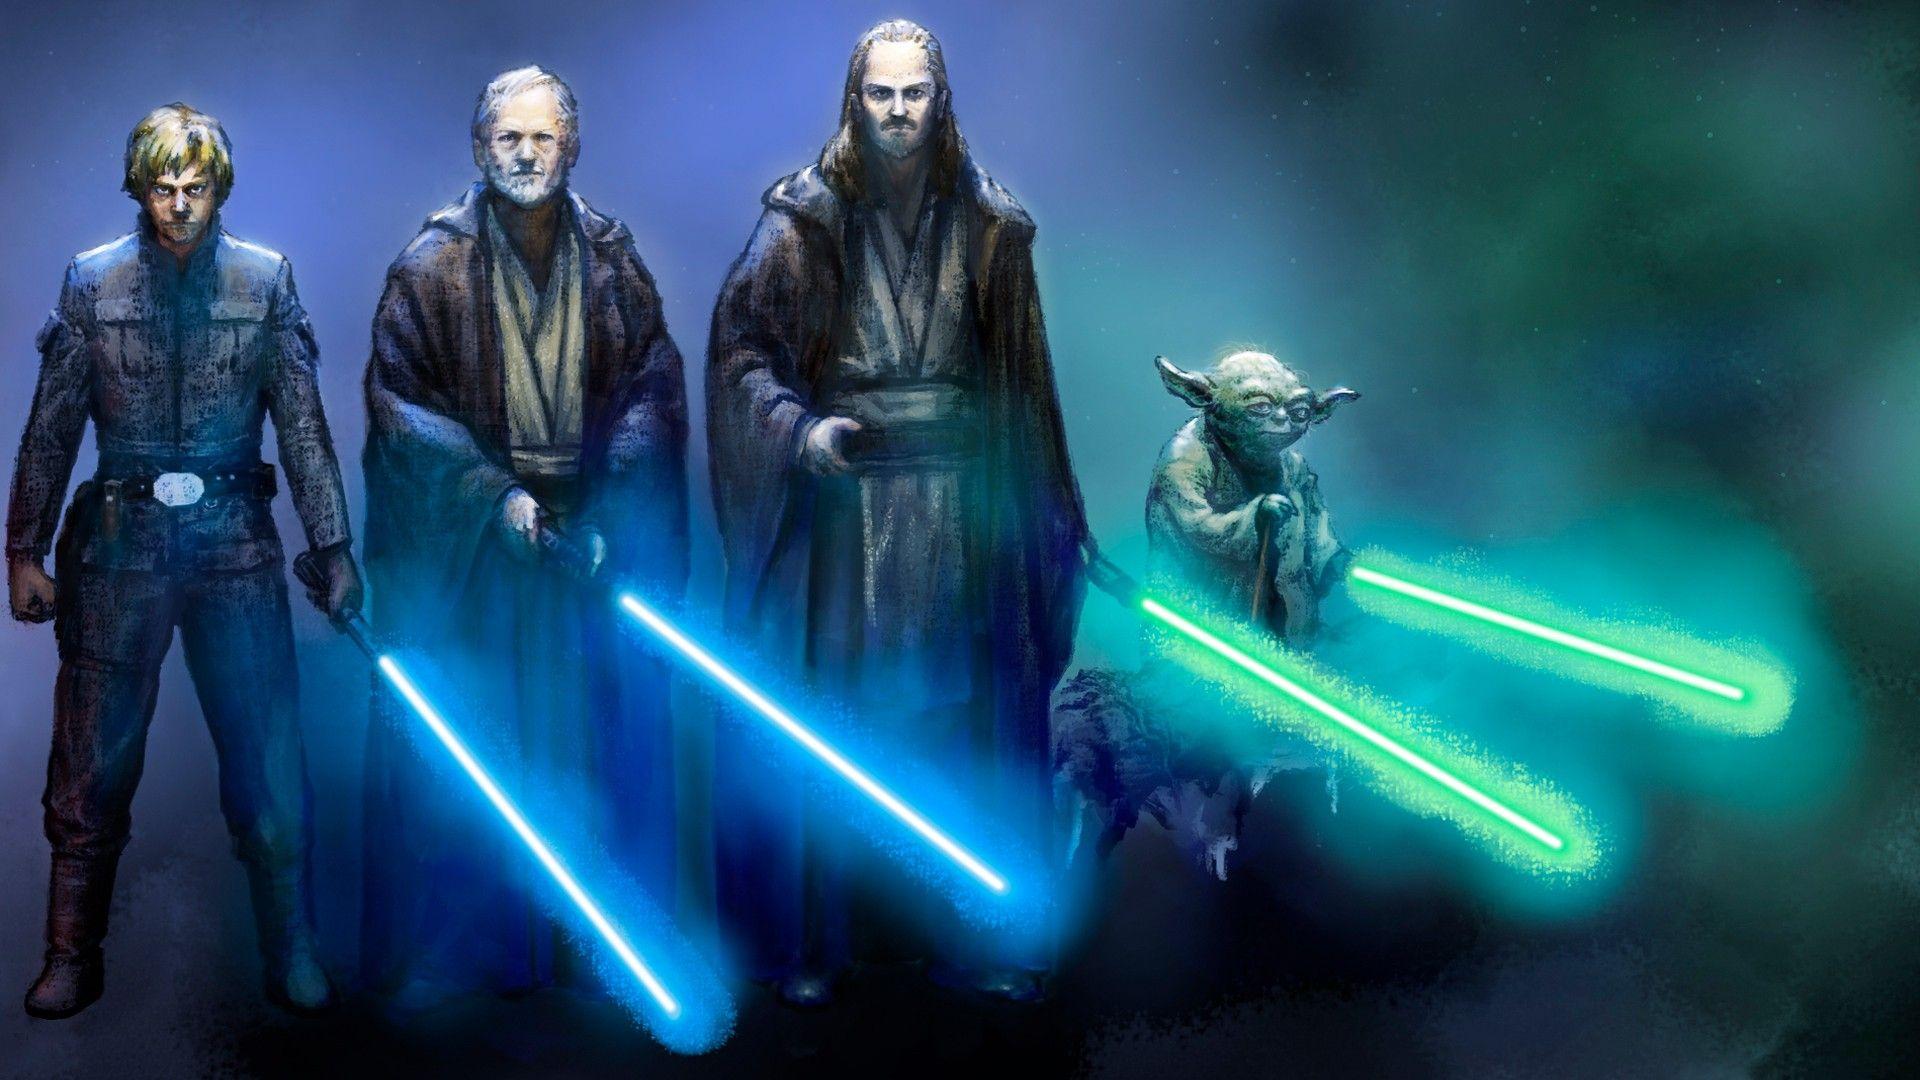 Free Download Star Wars Yoda Hd Wallpaper Fullhdwpp Full Hd Wallpapers 1920x1080 For Your Desktop Mobile Tablet Explore 45 Yoda Wallpaper Hd Star Wars Finn Wallpaper Jedi Master Yoda